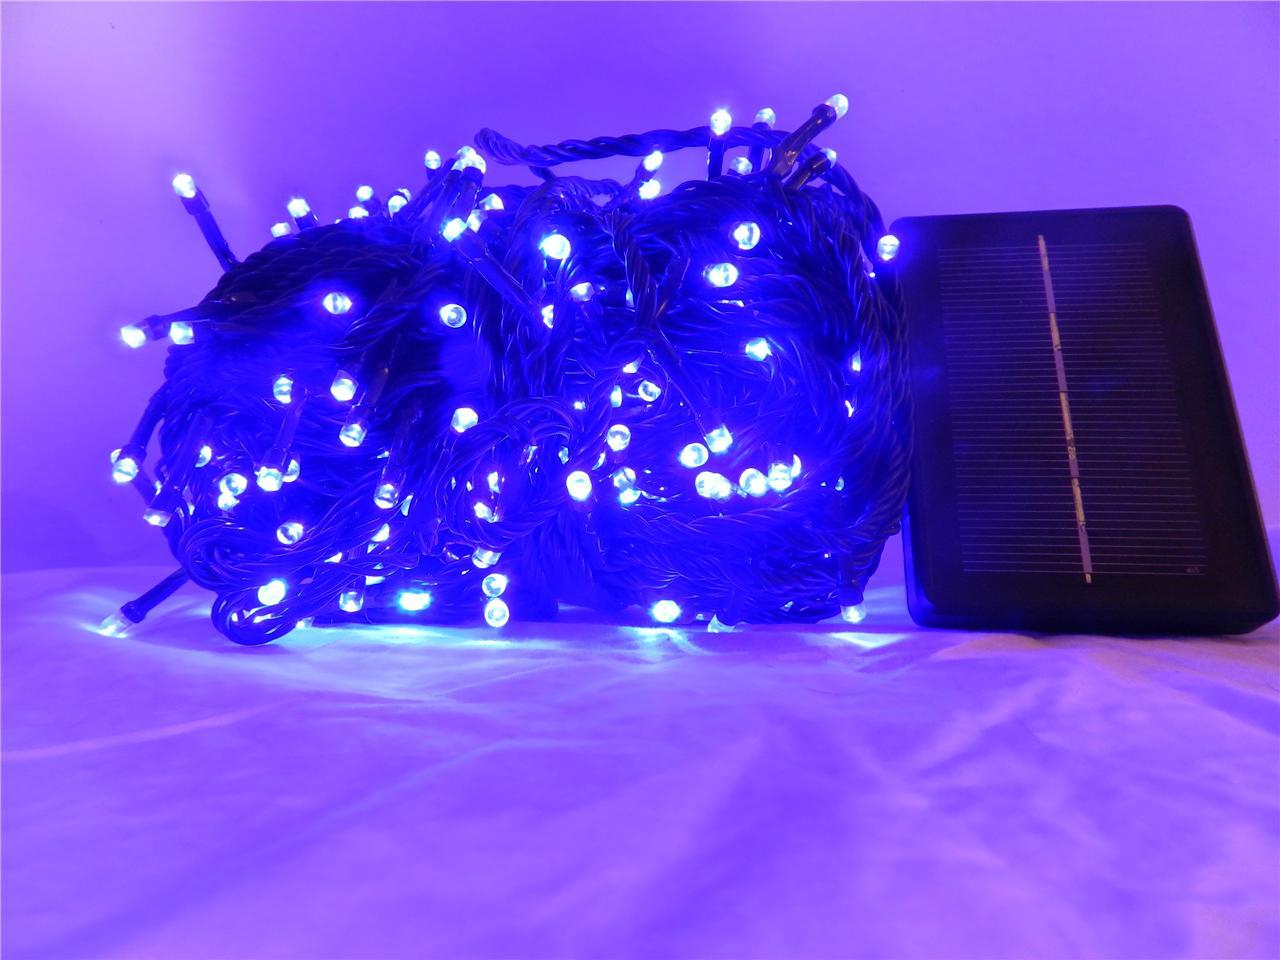 SOLAR 500 LED Bright Blue Outdoor Christmas Fairy String Light Decoration eBay